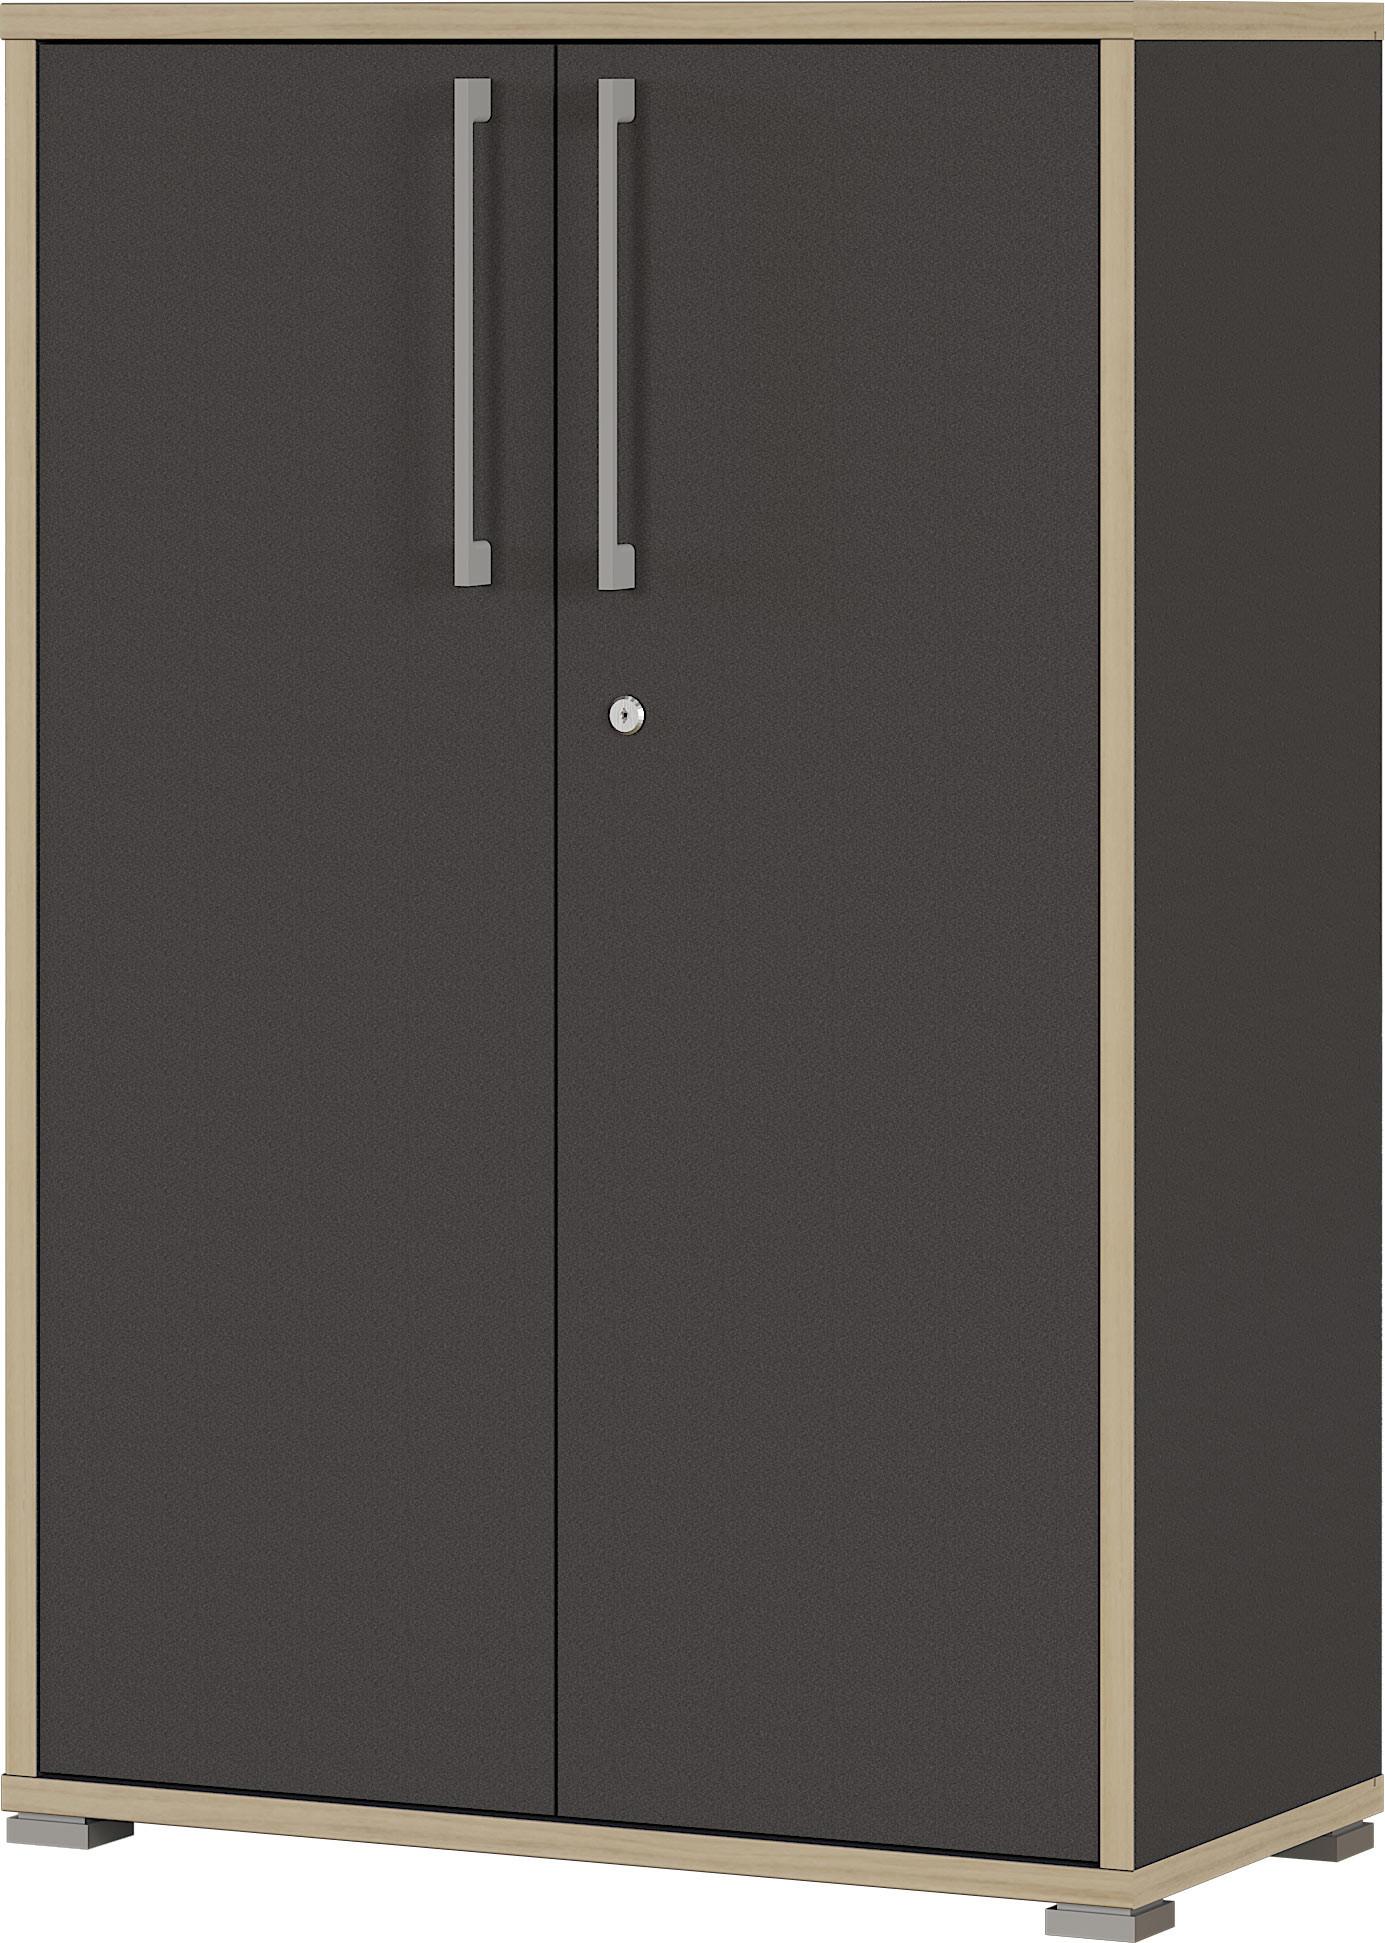 Armoire de bureau contemporaine anthracite hauteur 112 cm Garland